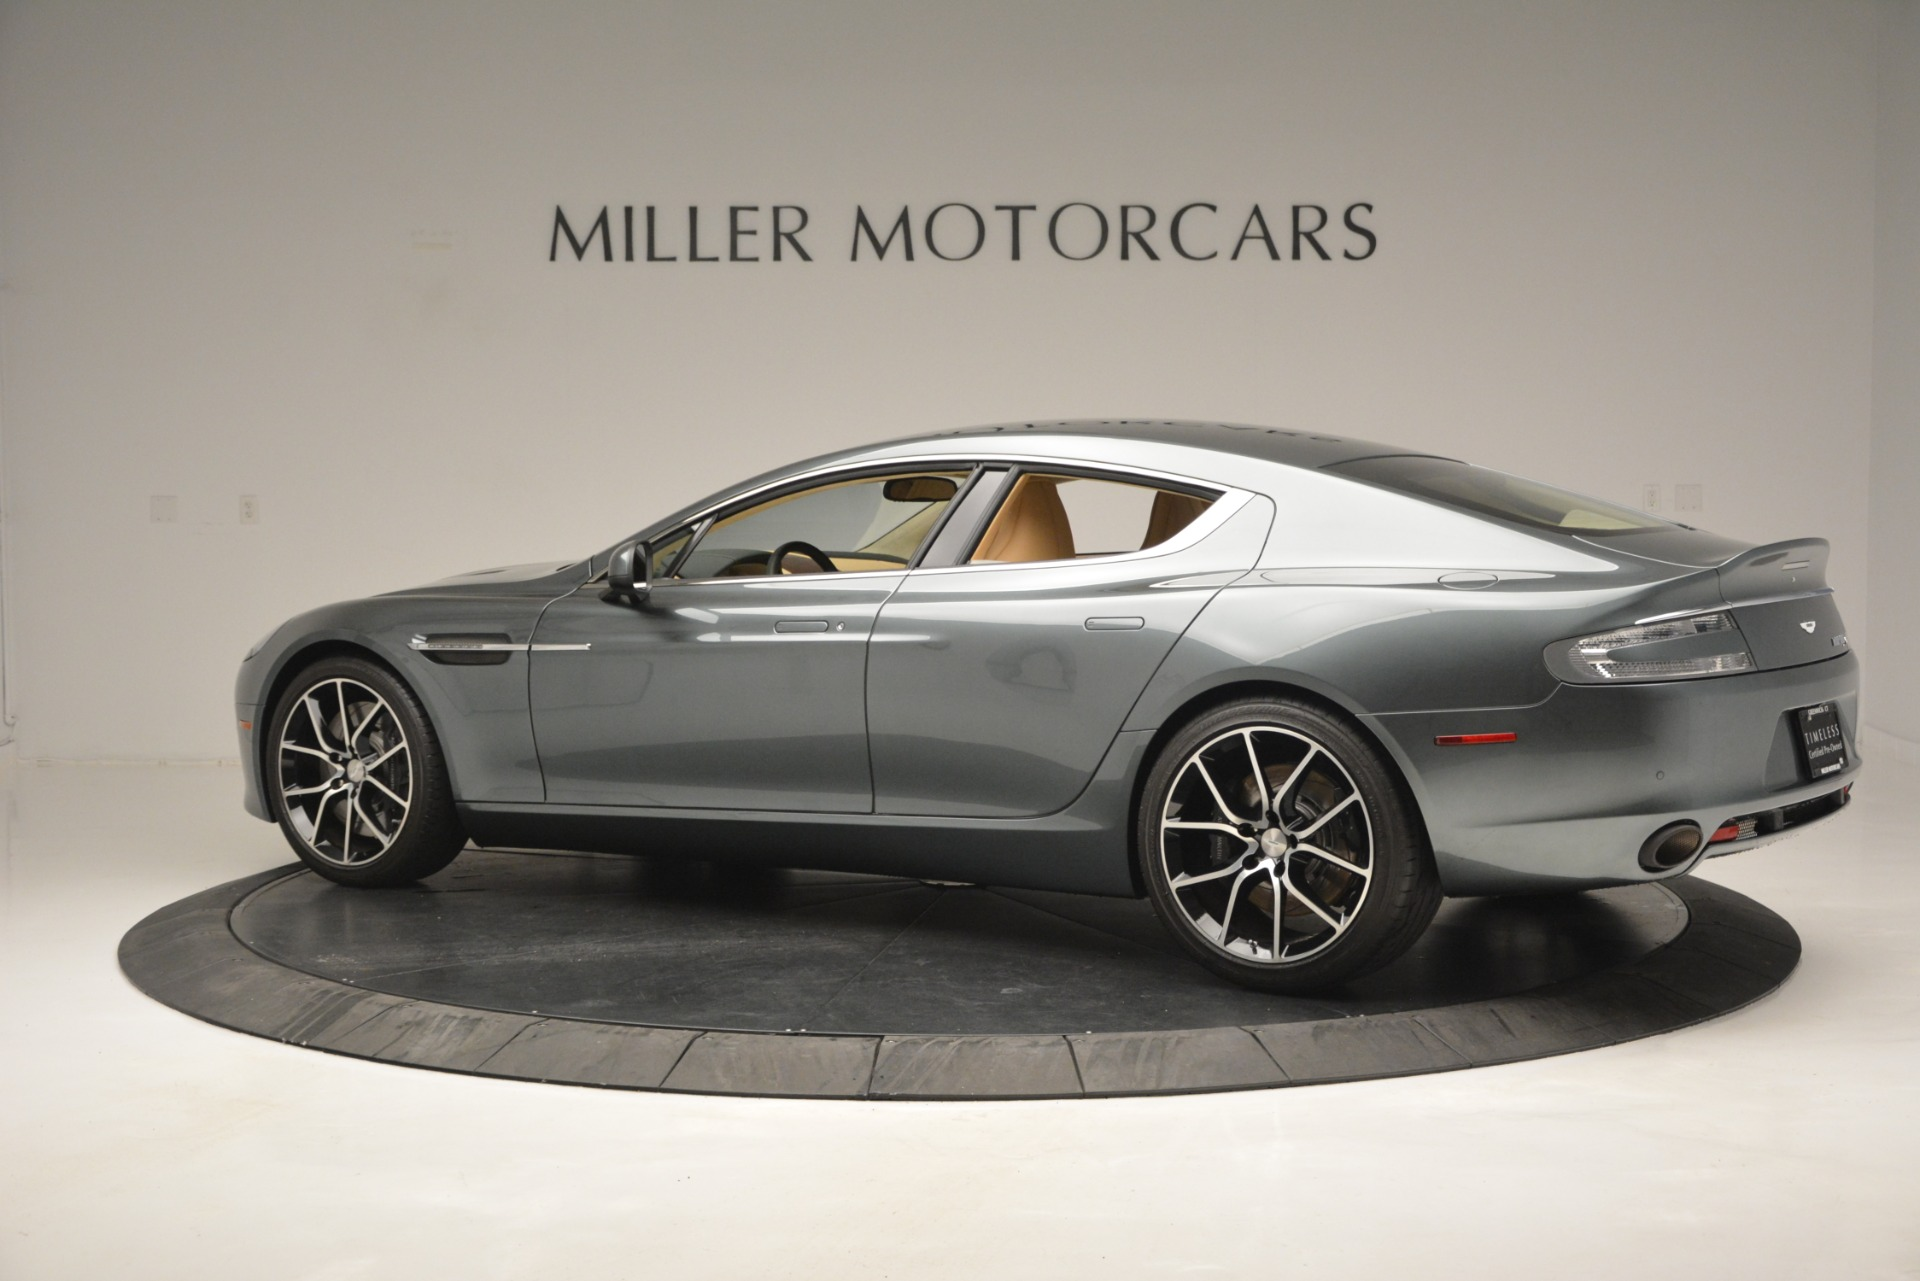 Used 2017 Aston Martin Rapide S Sedan For Sale In Greenwich, CT 2889_p4